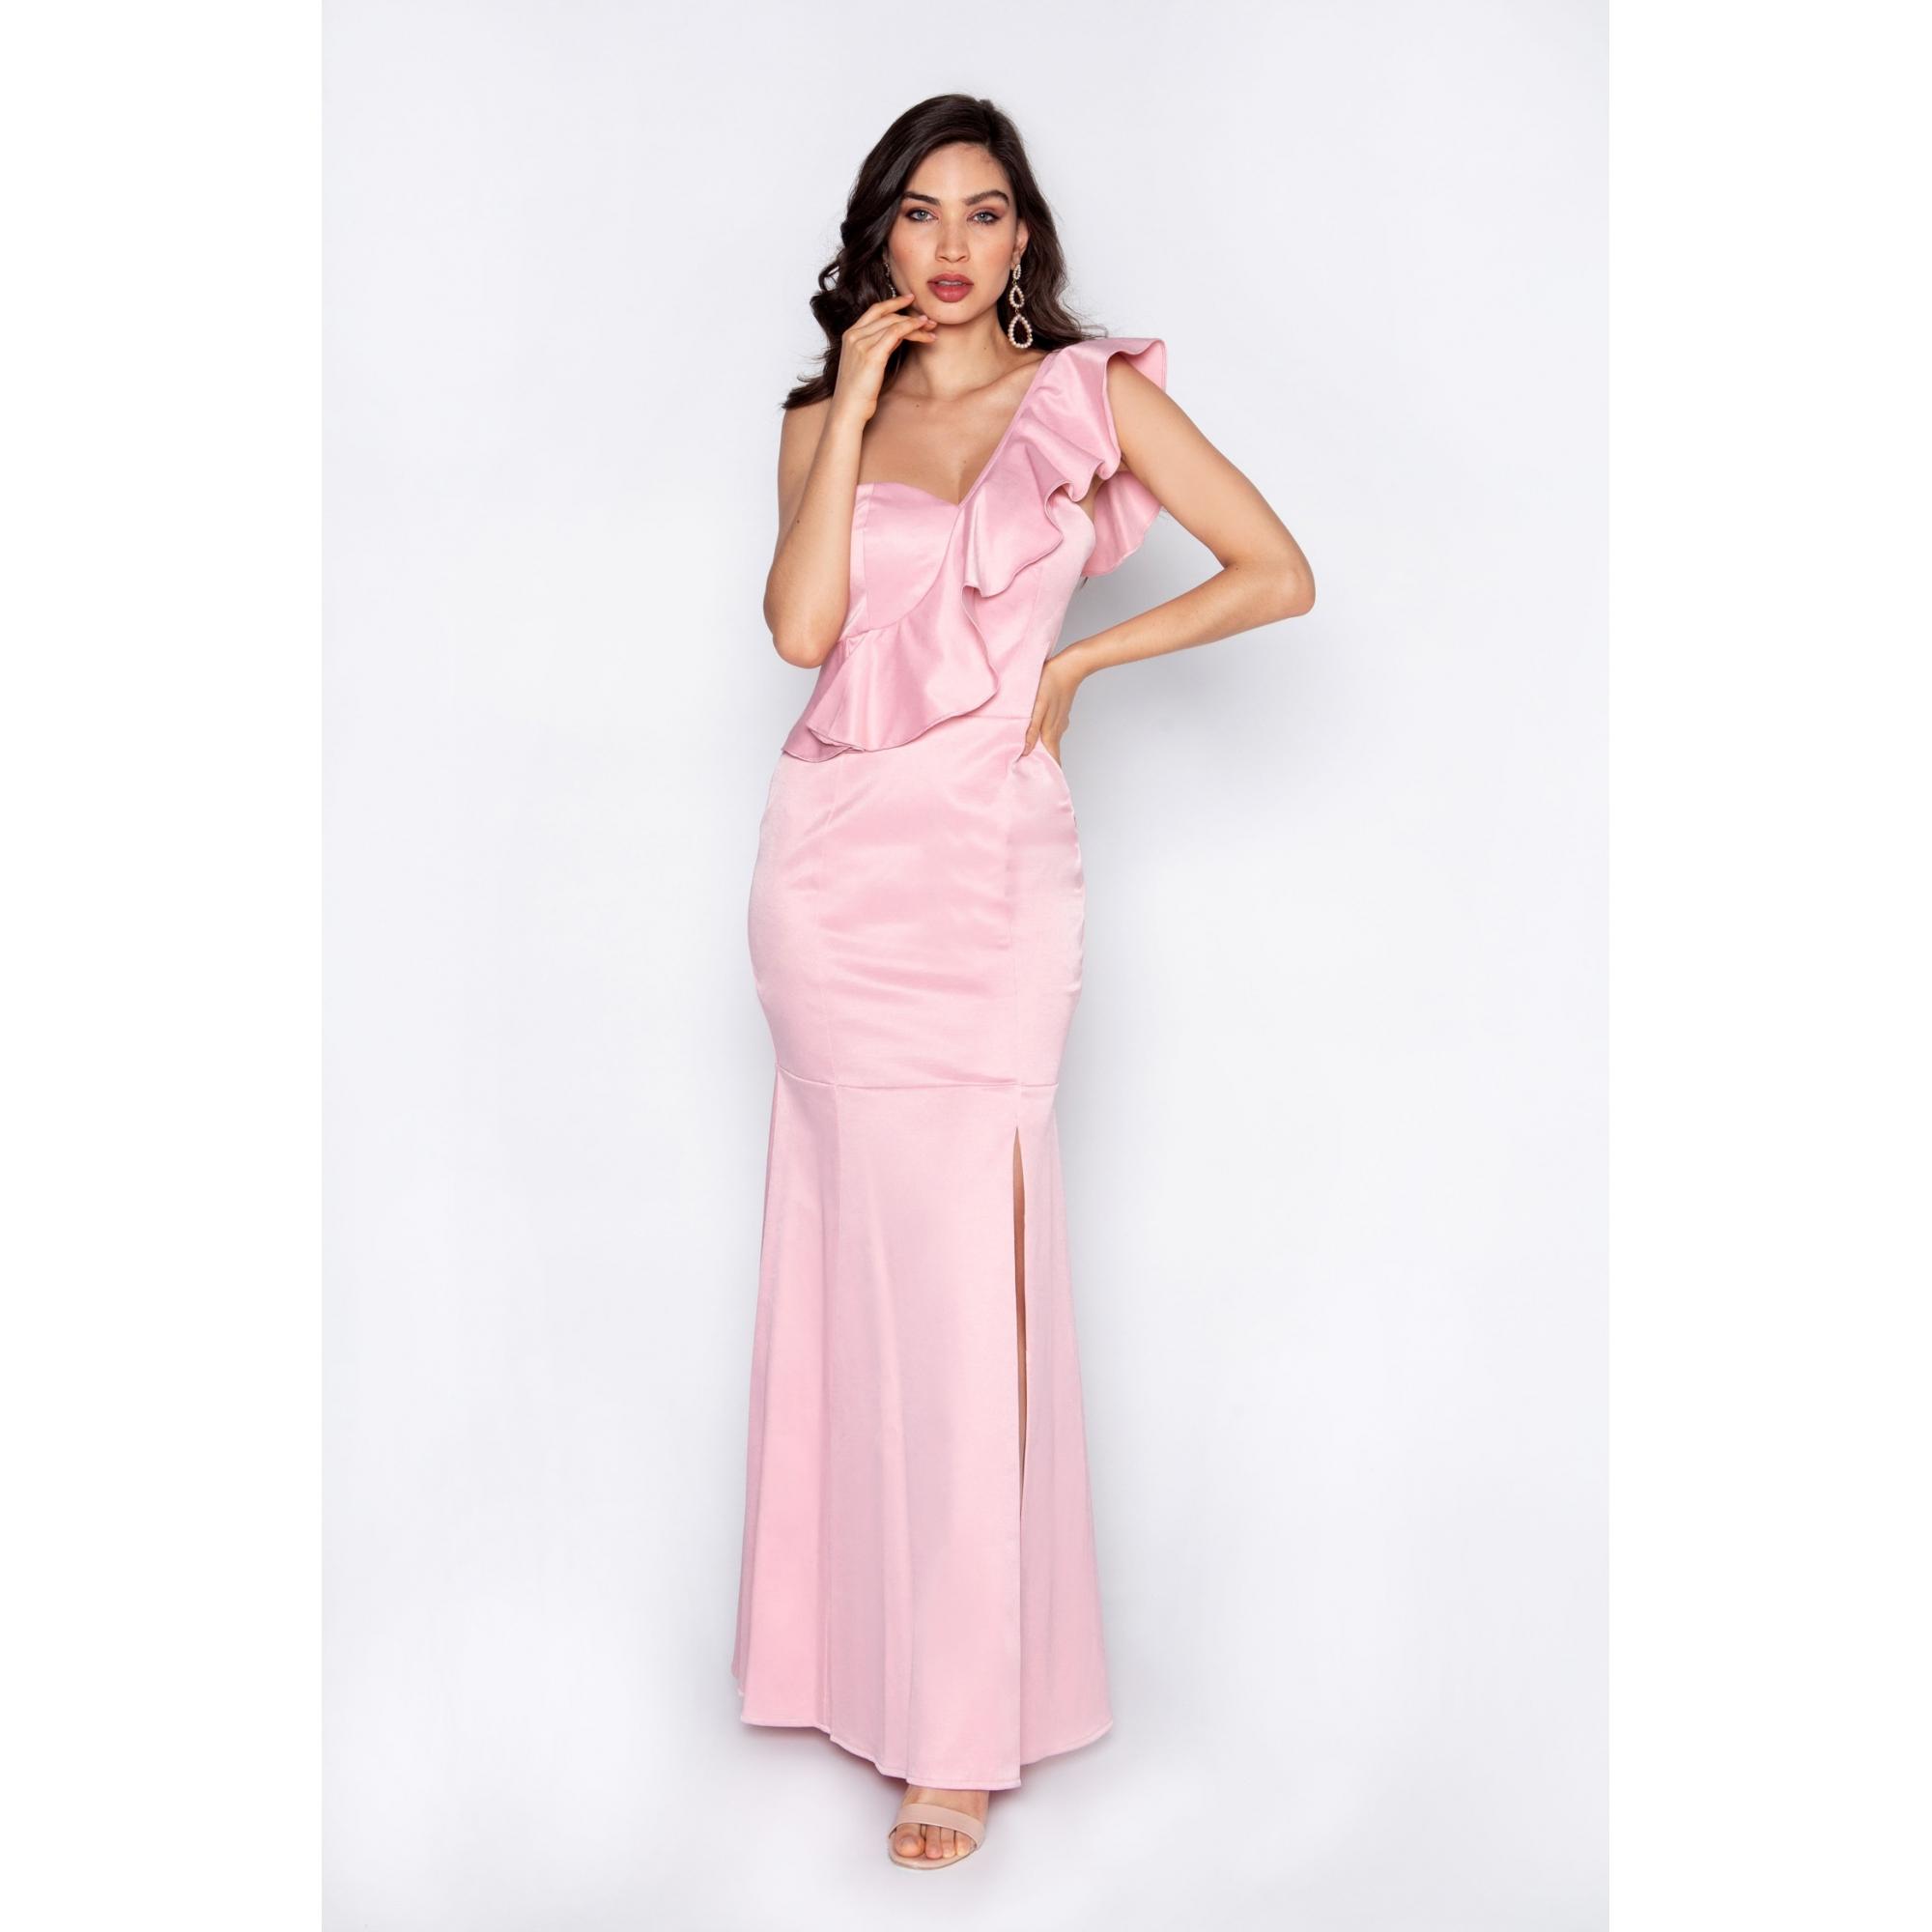 Vestido de festa longo um ombro rosa ref.P504